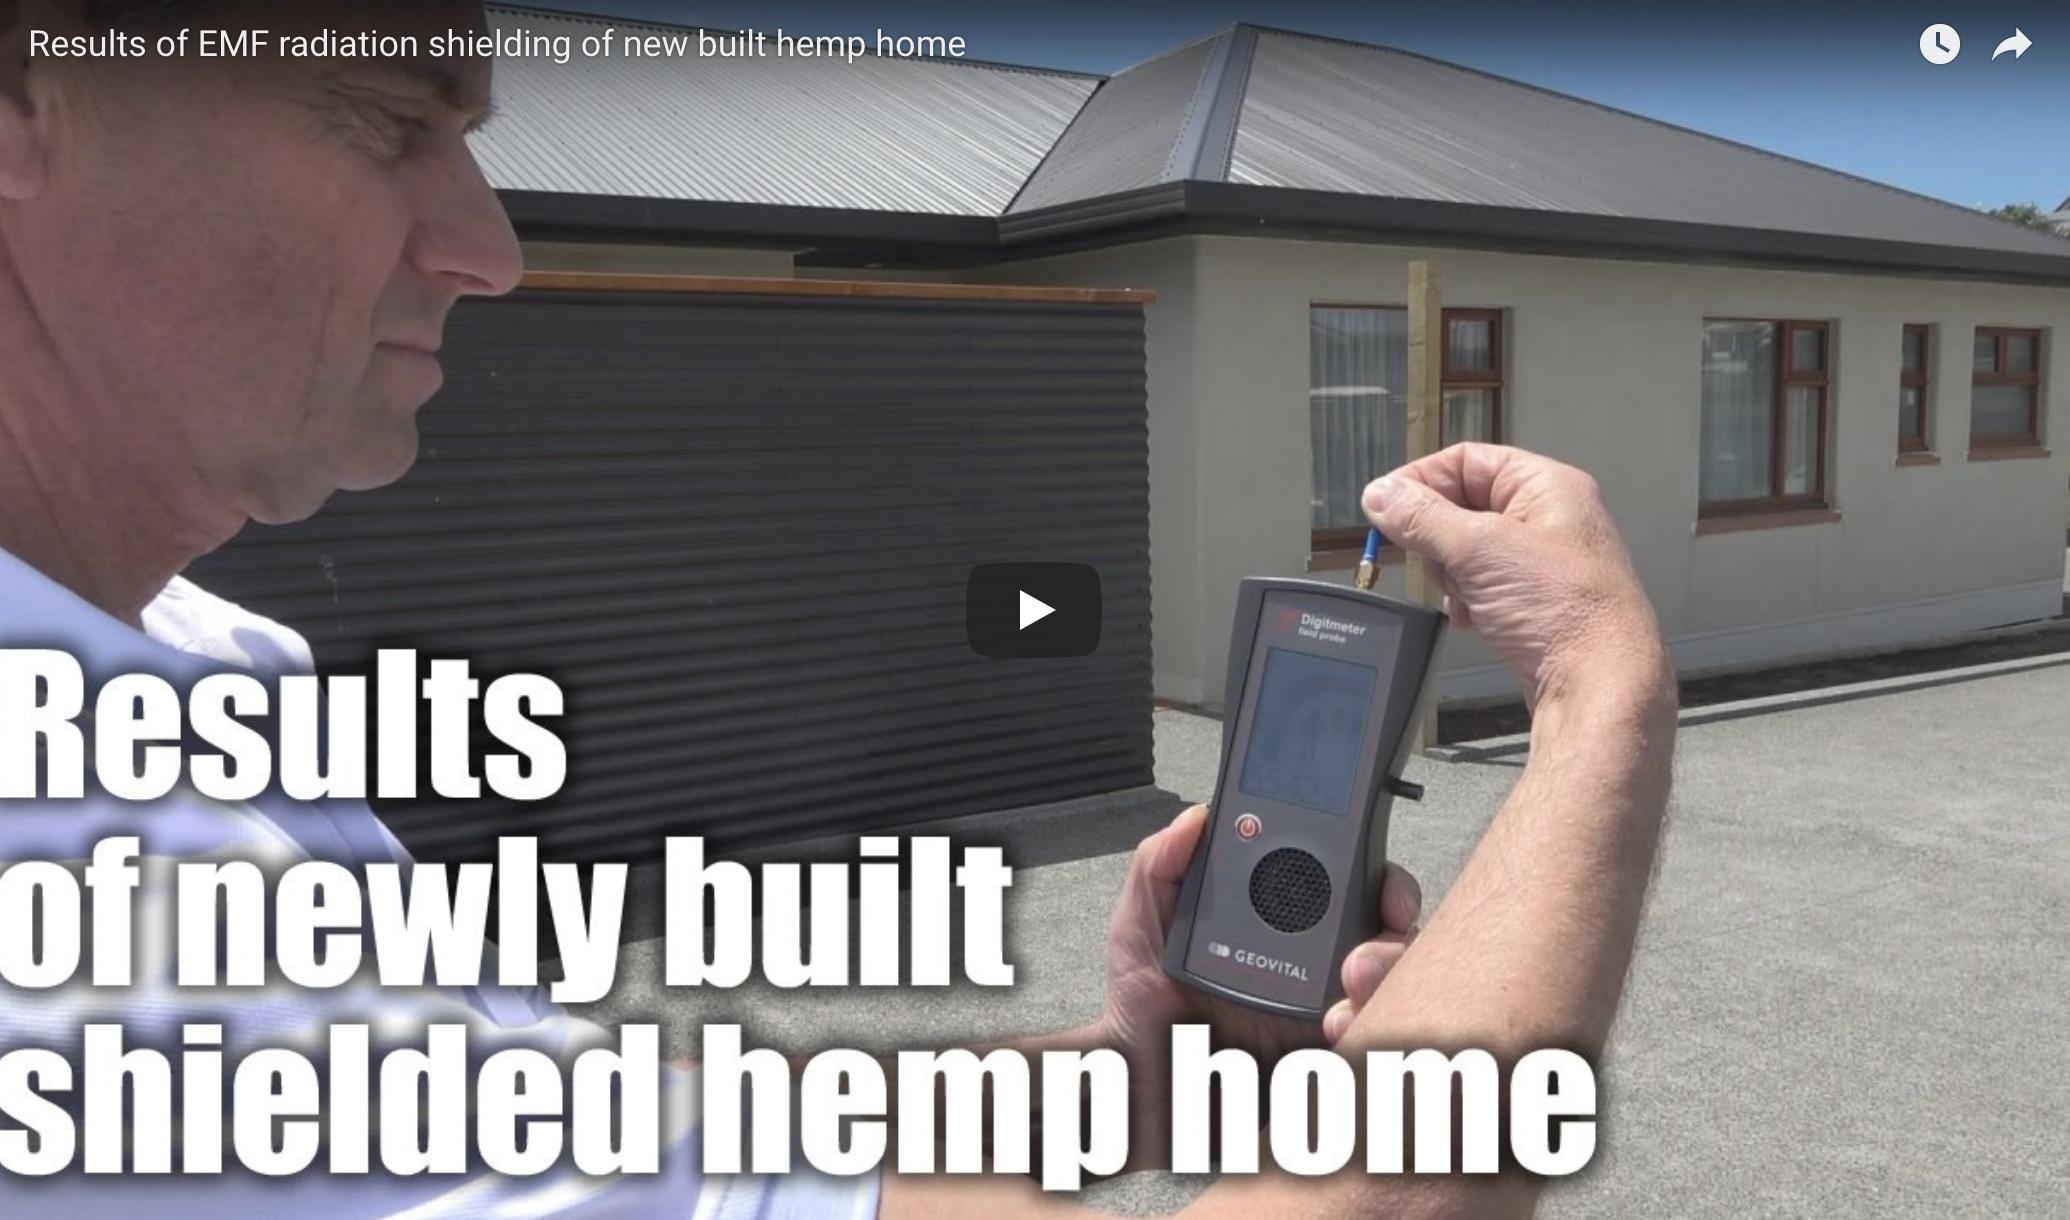 Video: Results of EMF radiation shielding of new built hemp home